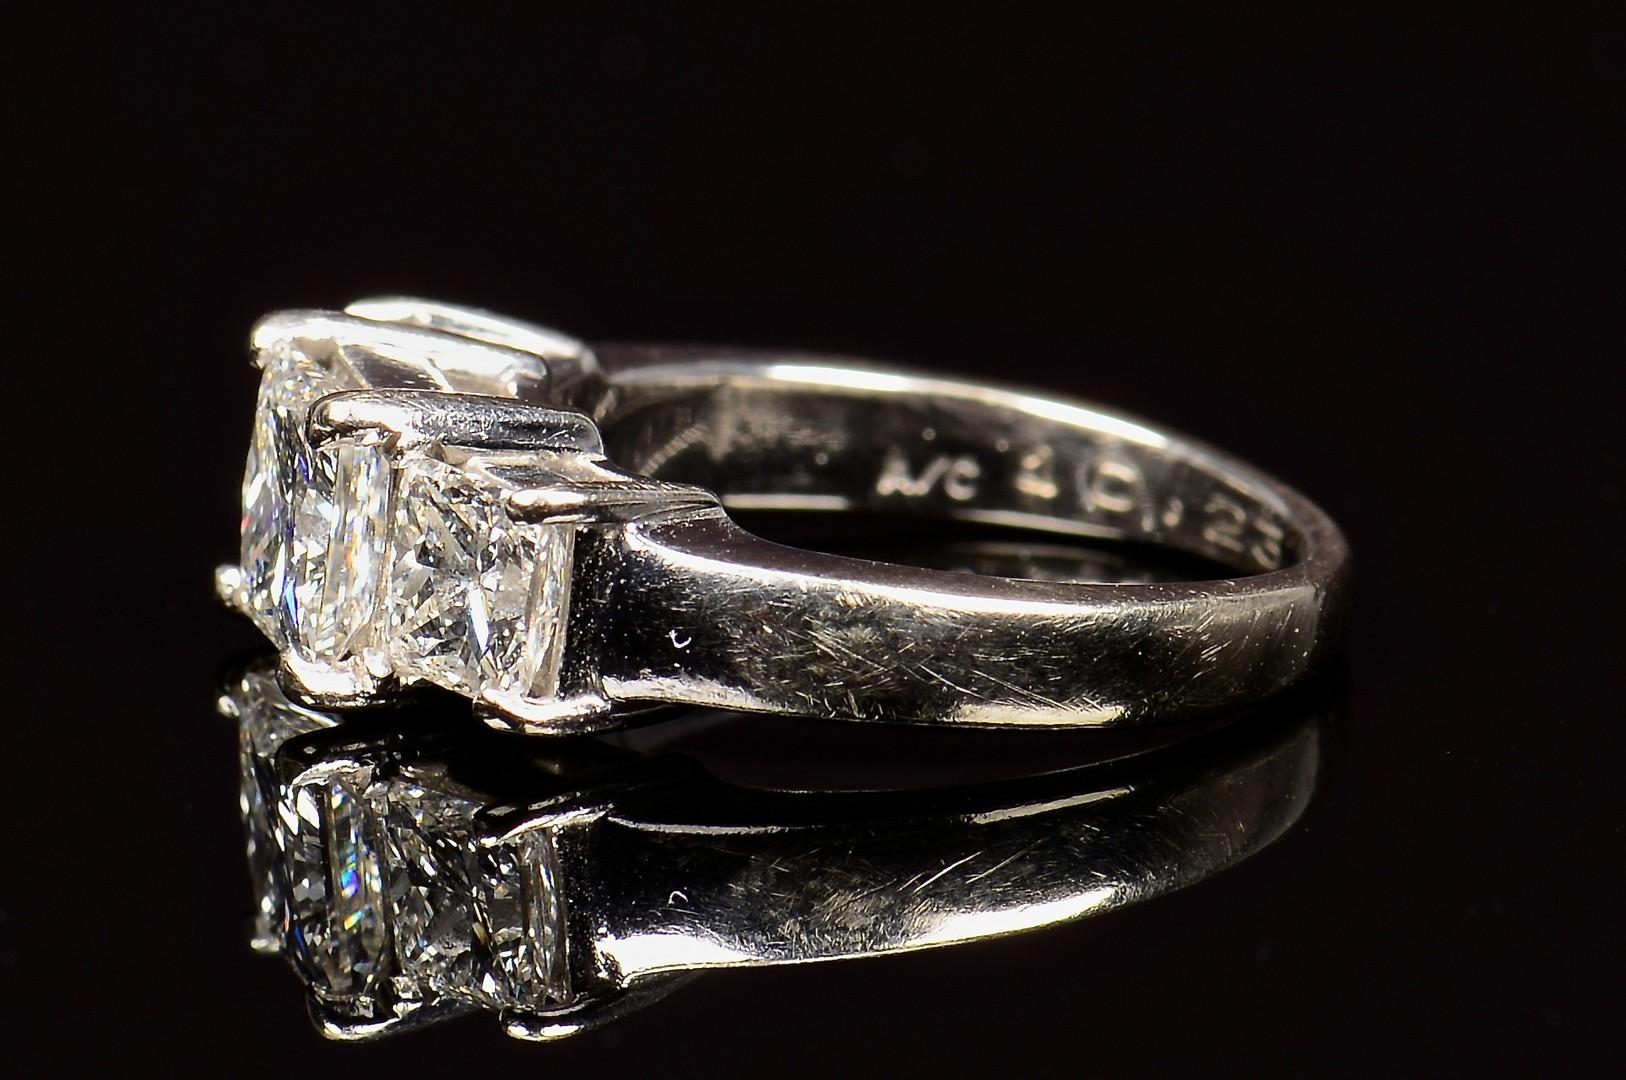 Lot 70: 14k 3-stone Princess cut dia ring, GIA Report